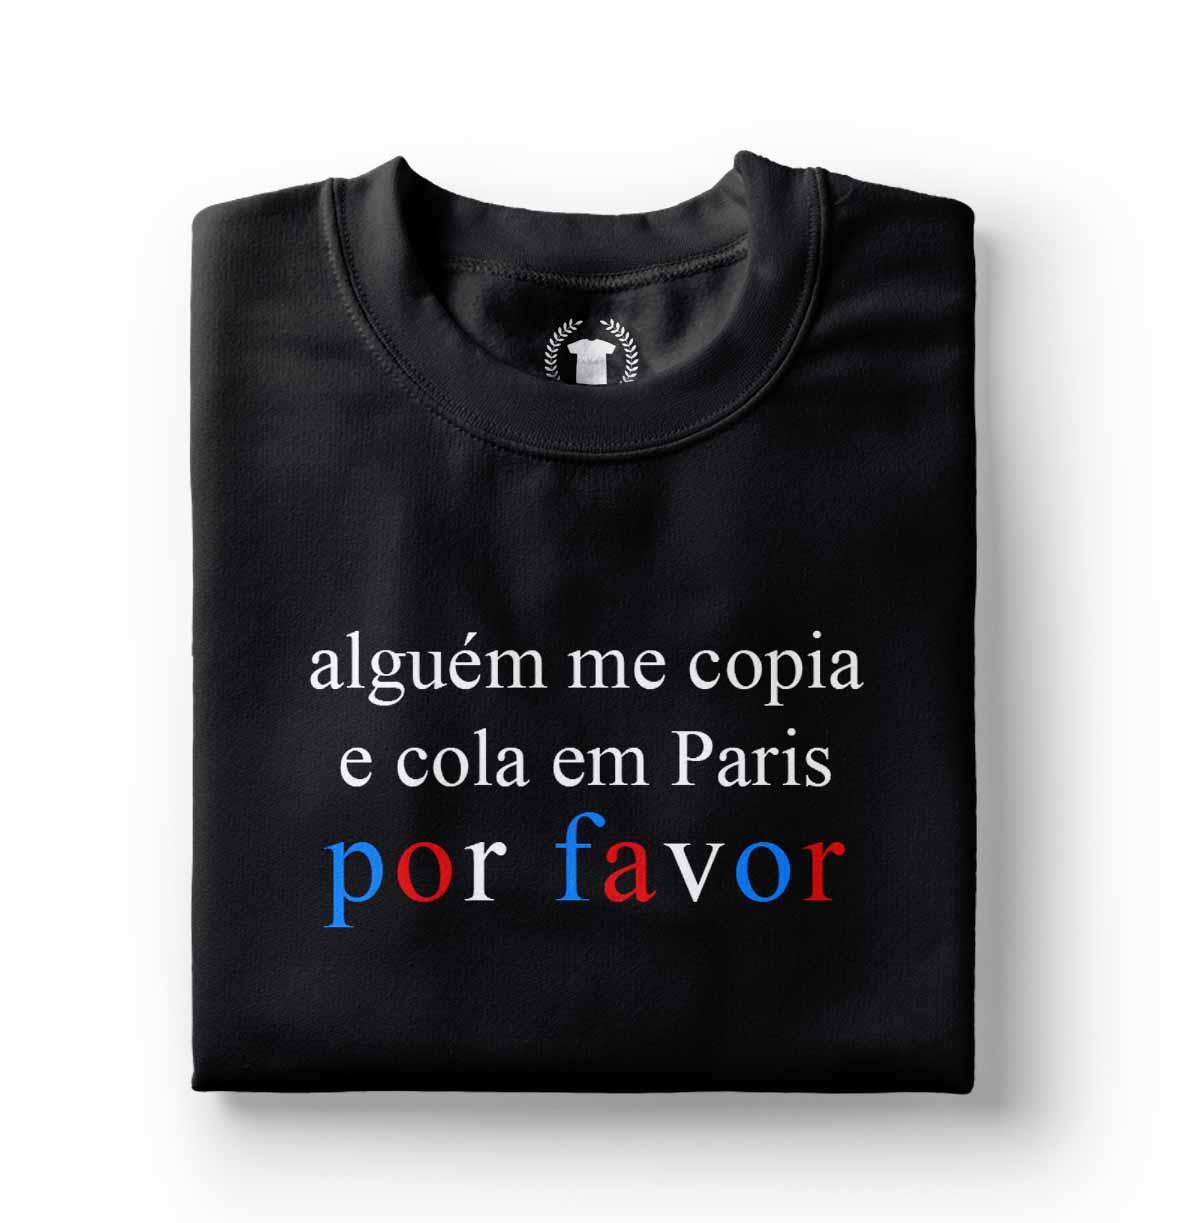 Camiseta Frase Humor Alguem me copia e cola em Paris